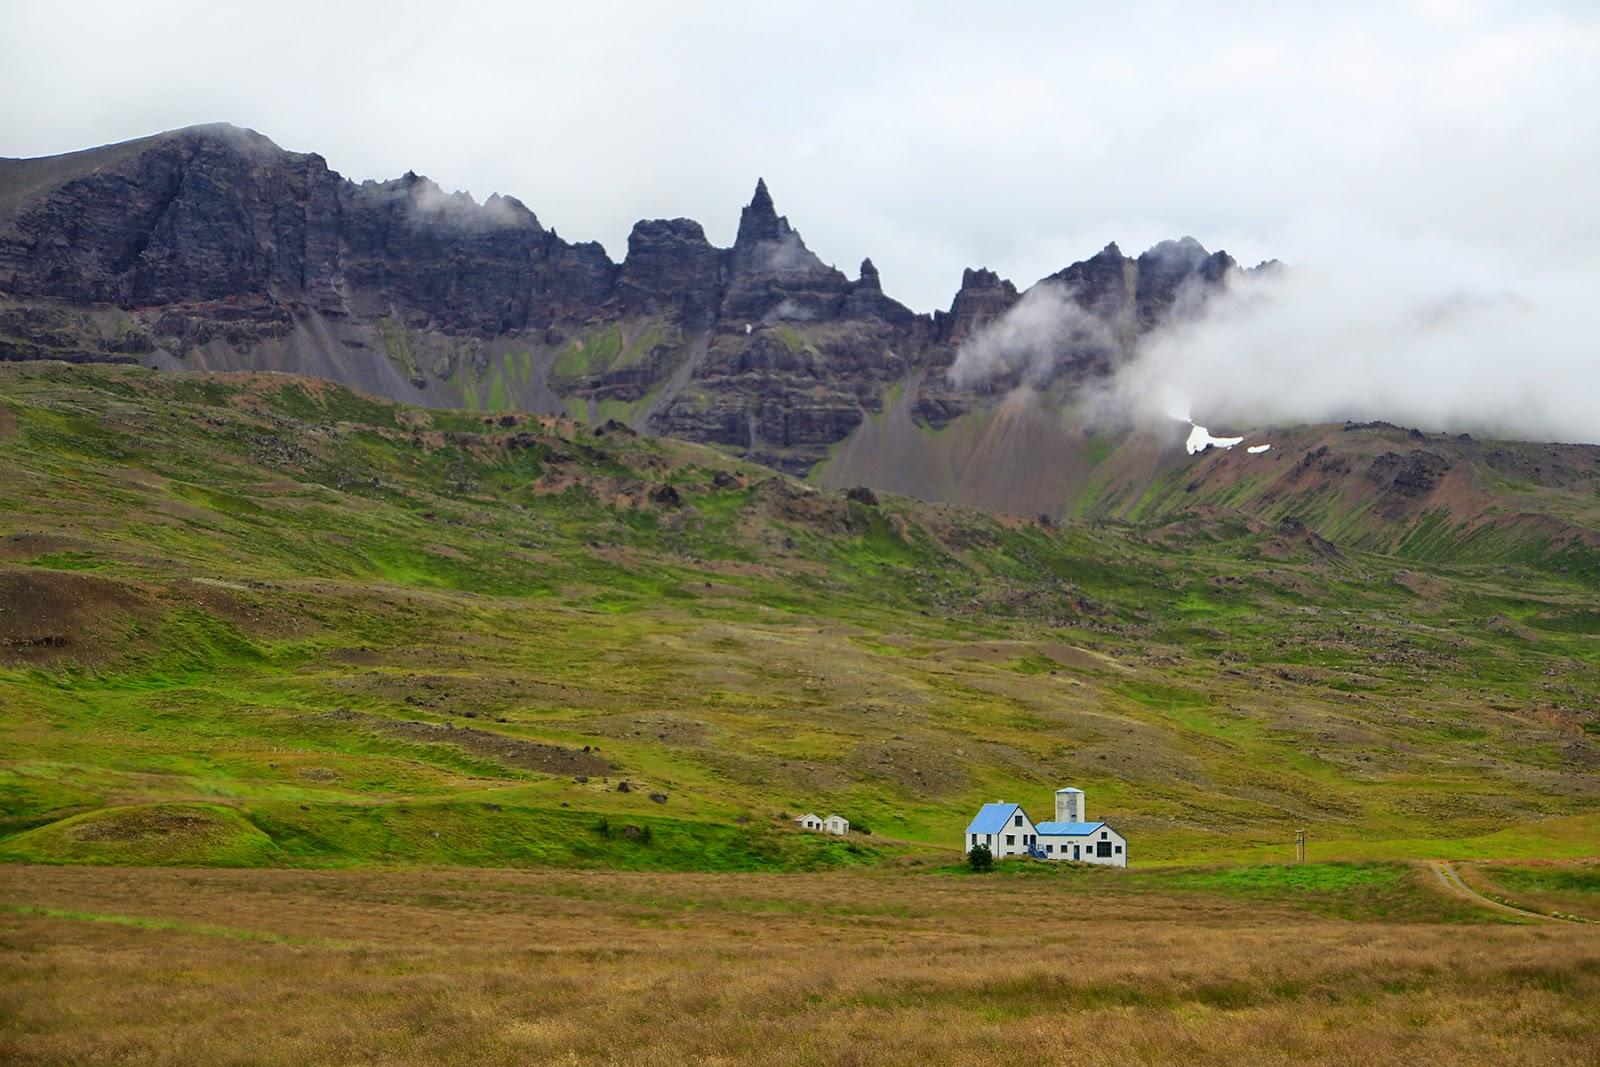 Islandia vol. 1 - North